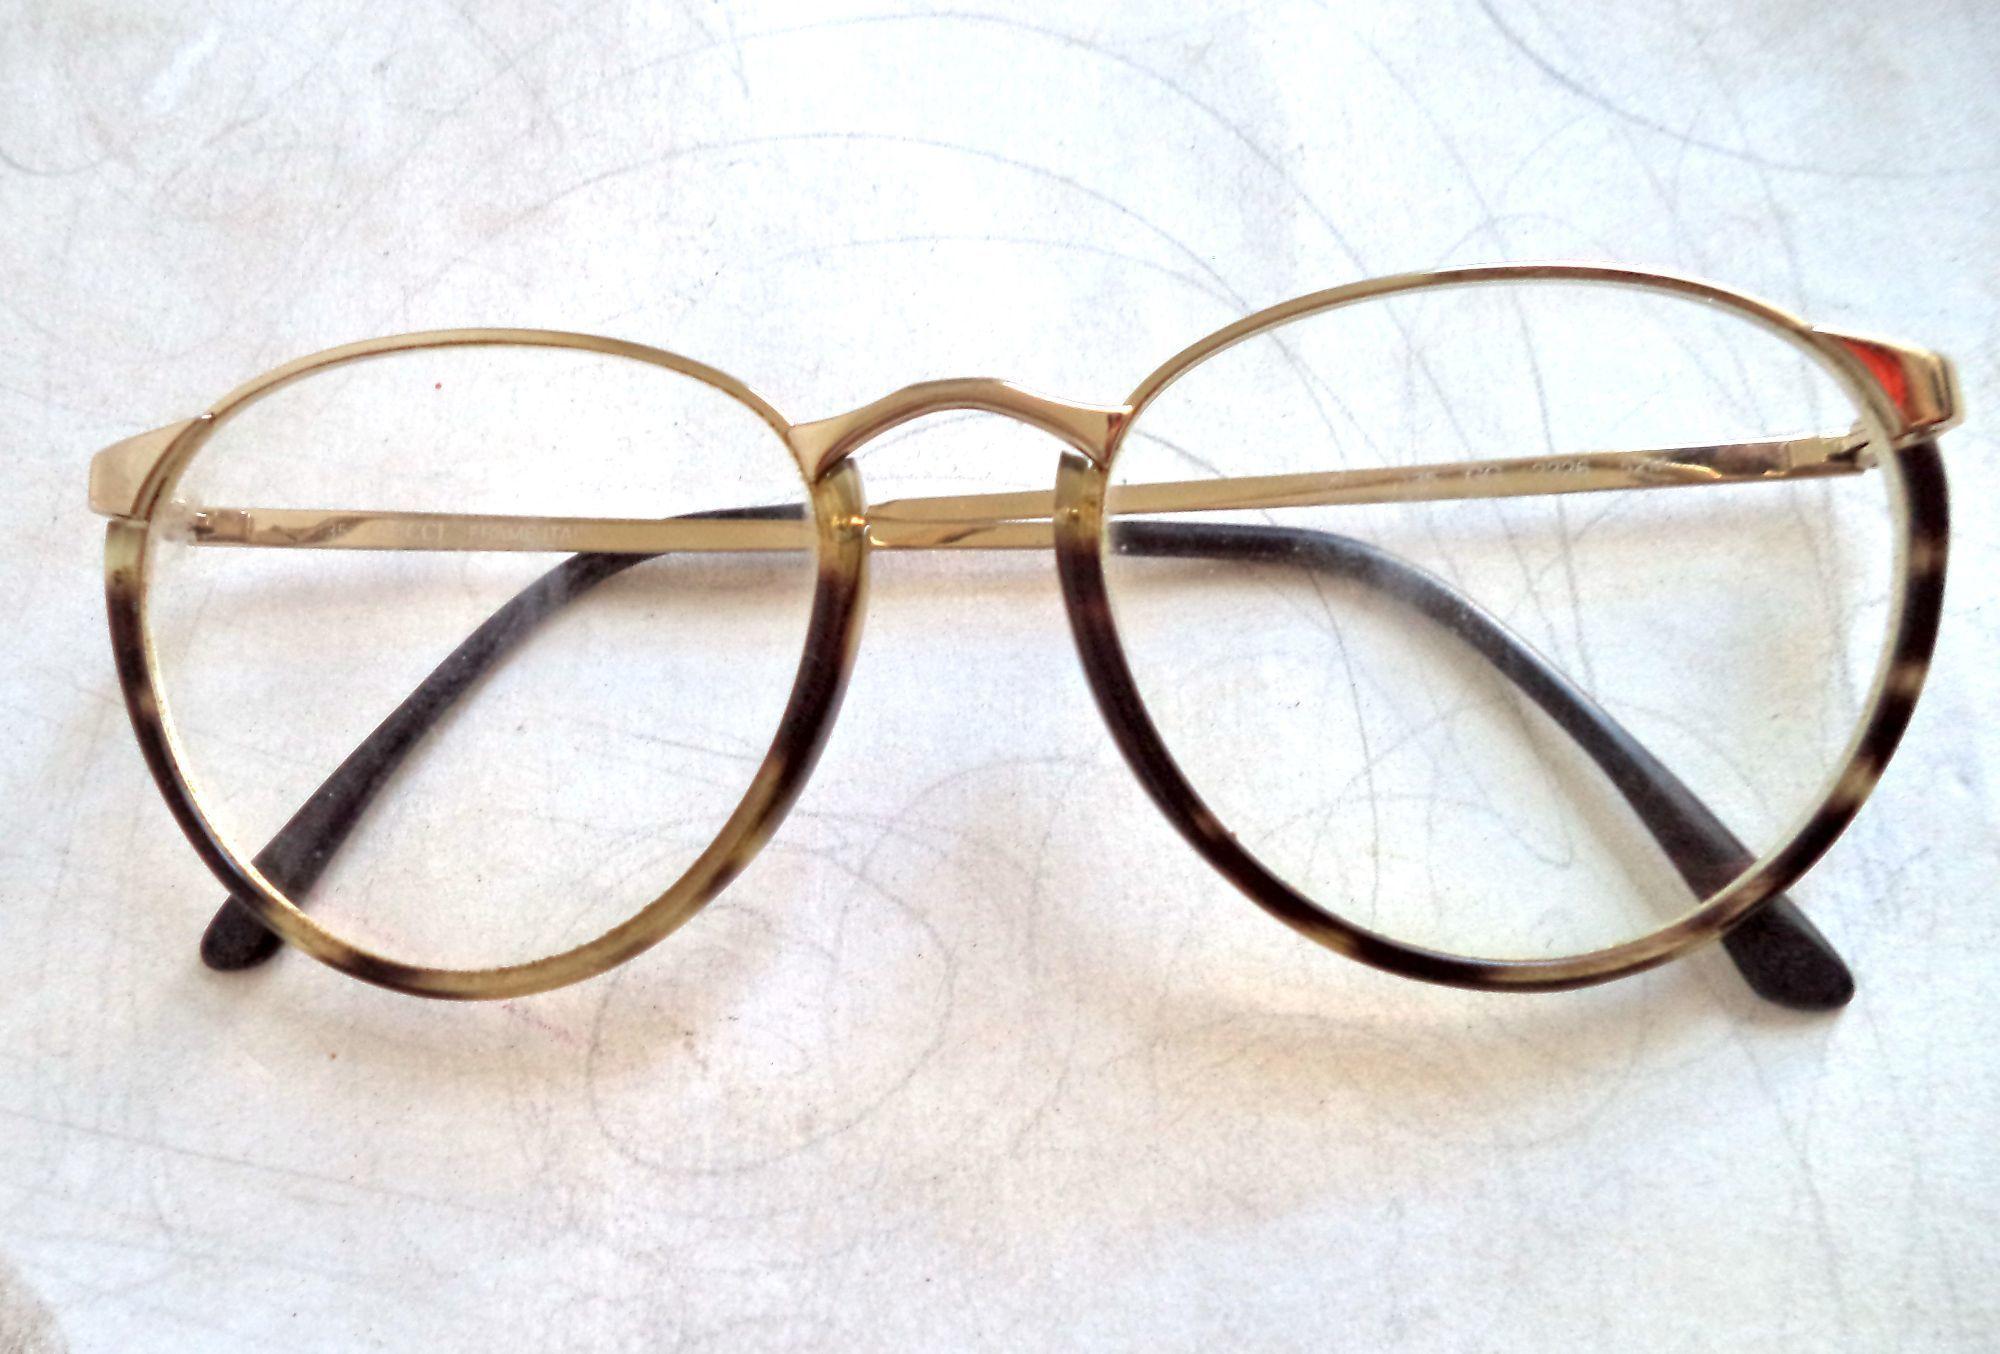 275649960f64 Gucci Model 2326 Round Tortoise Gold Womens Eyeglasses 52-17 Sunglasses Vtg  80s